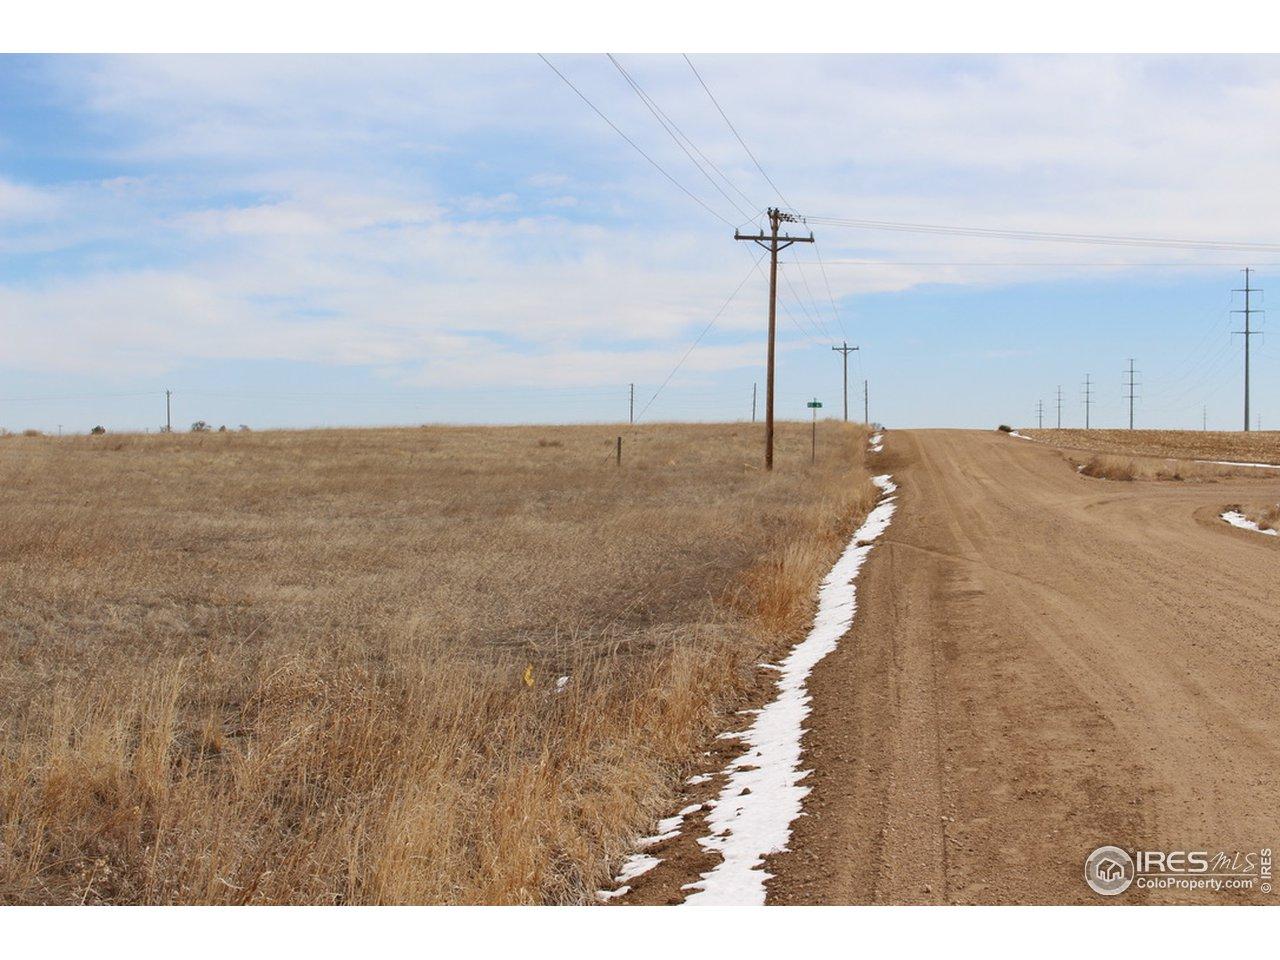 Looking East.Property line is near power pole